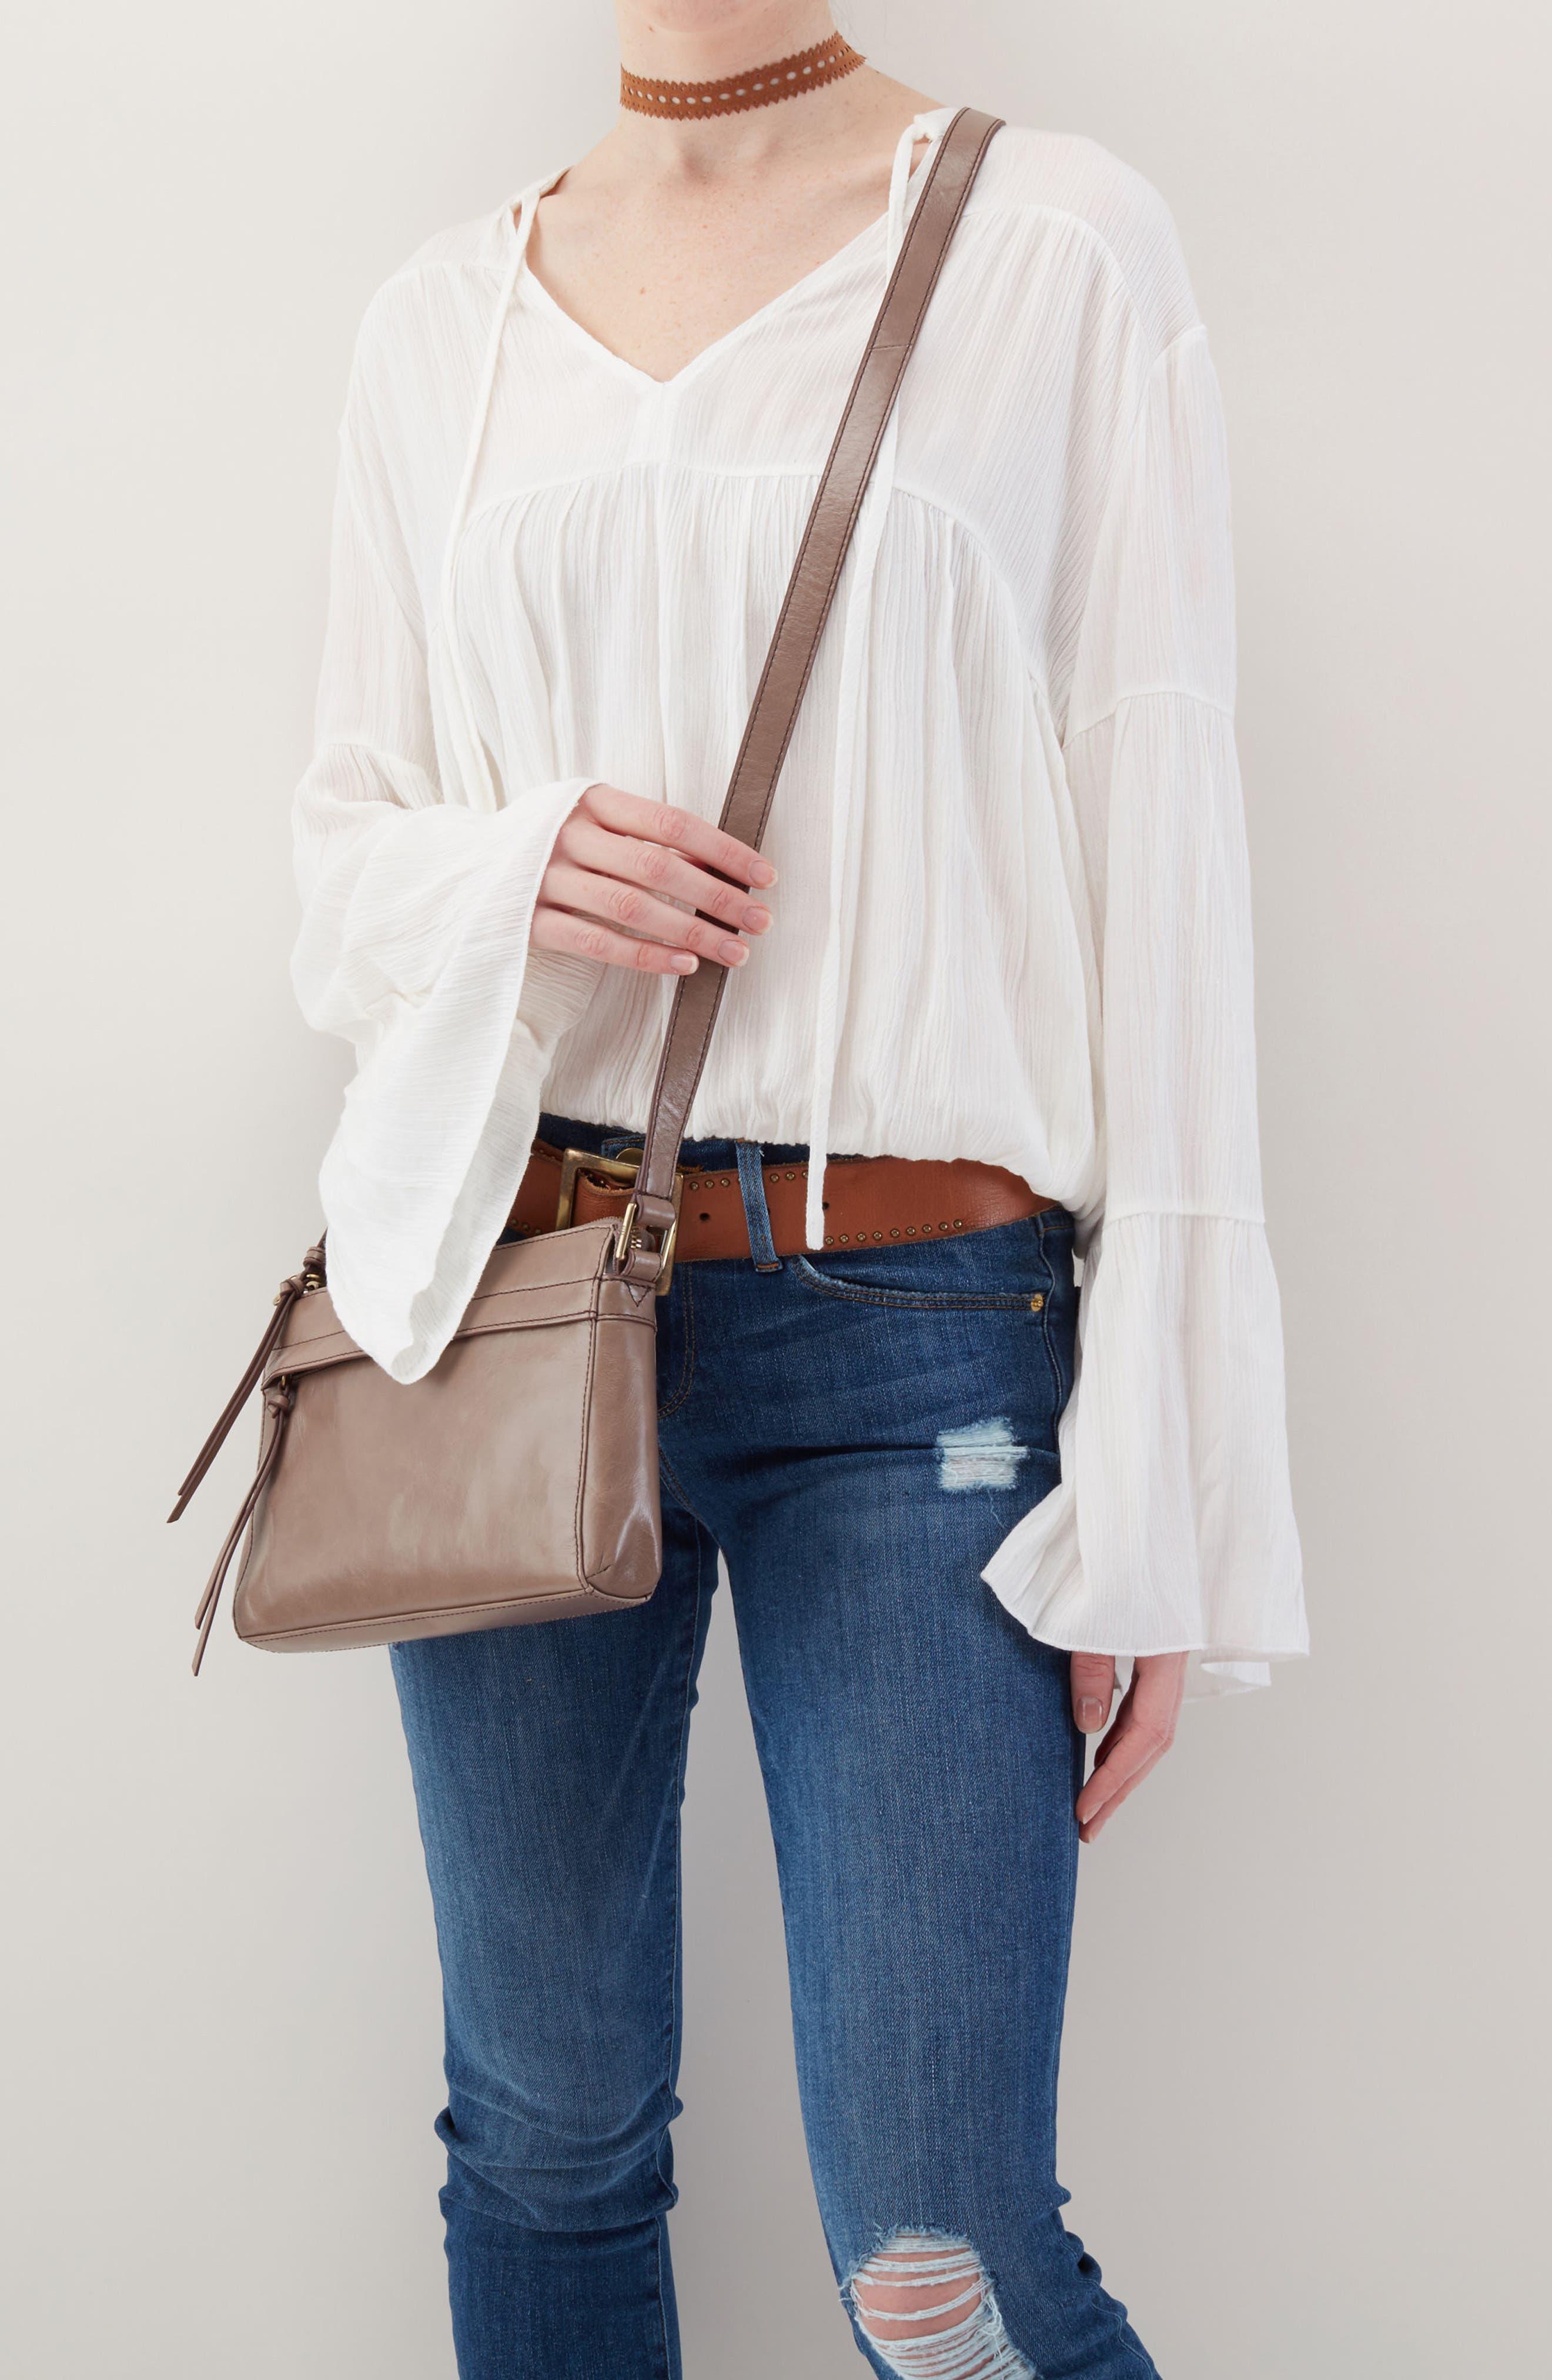 Tobey Leather Crossbody Bag,                             Alternate thumbnail 2, color,                             Ash